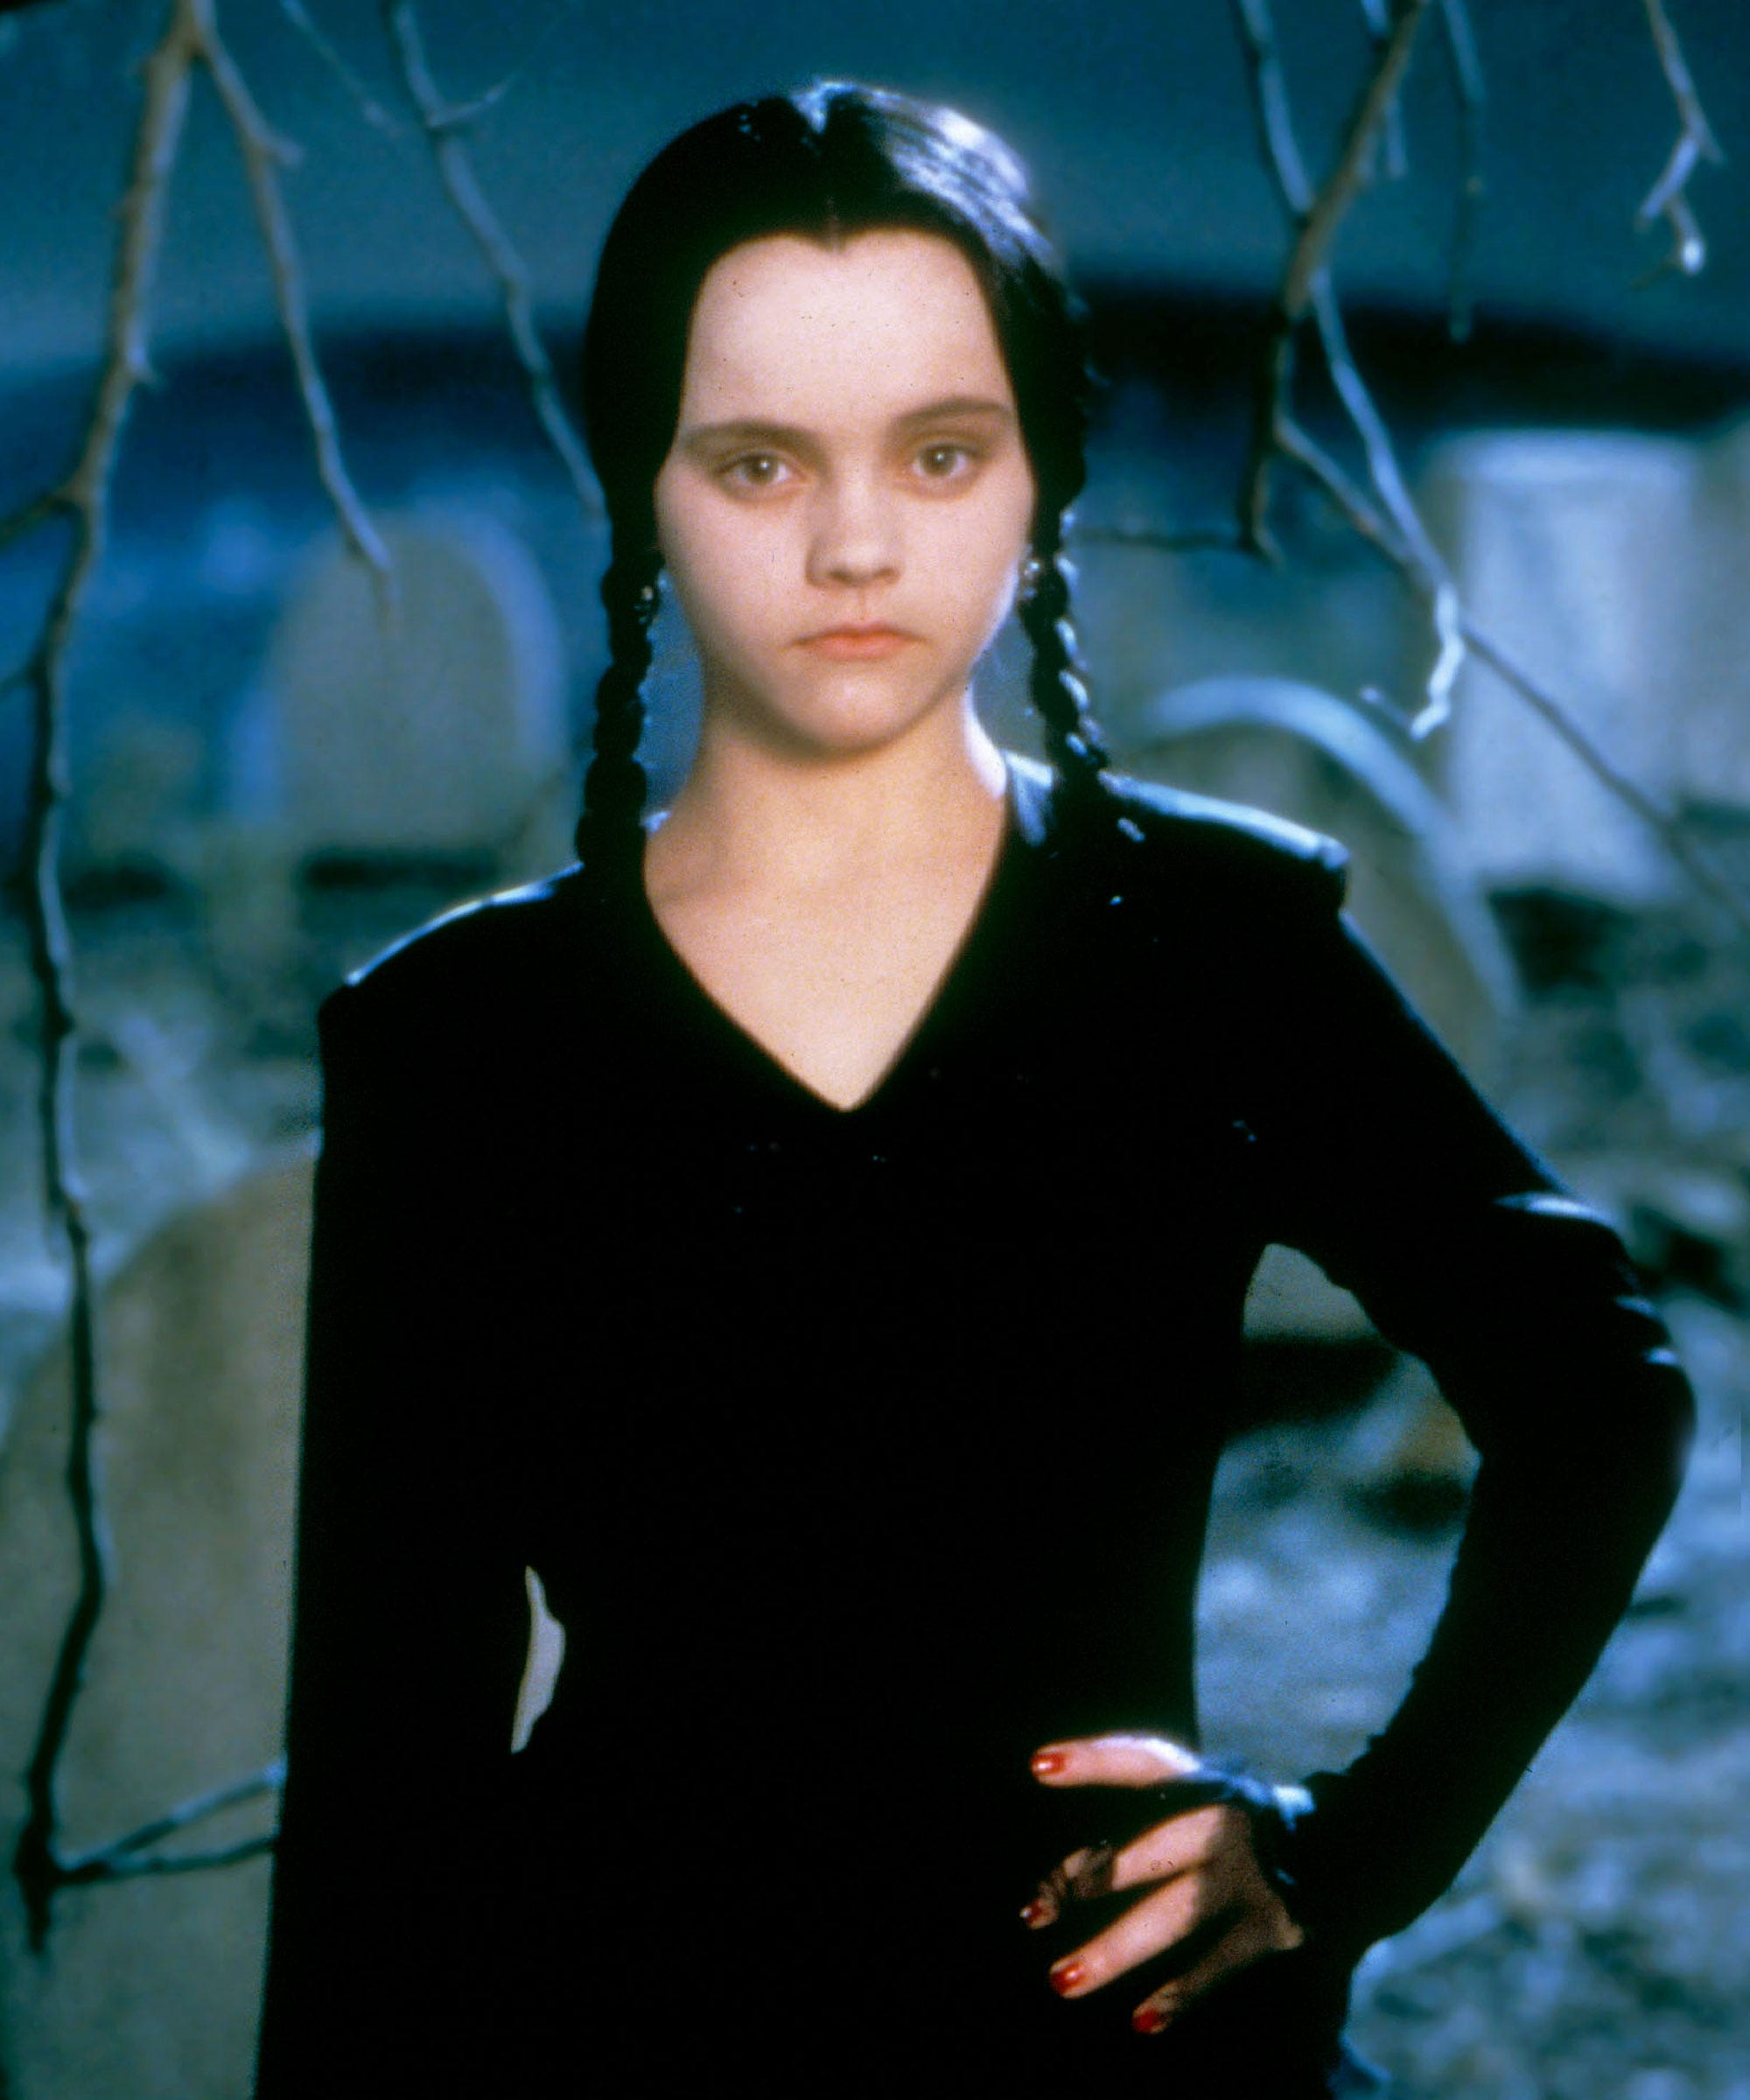 wednesday addams halloween costume wig dress all black